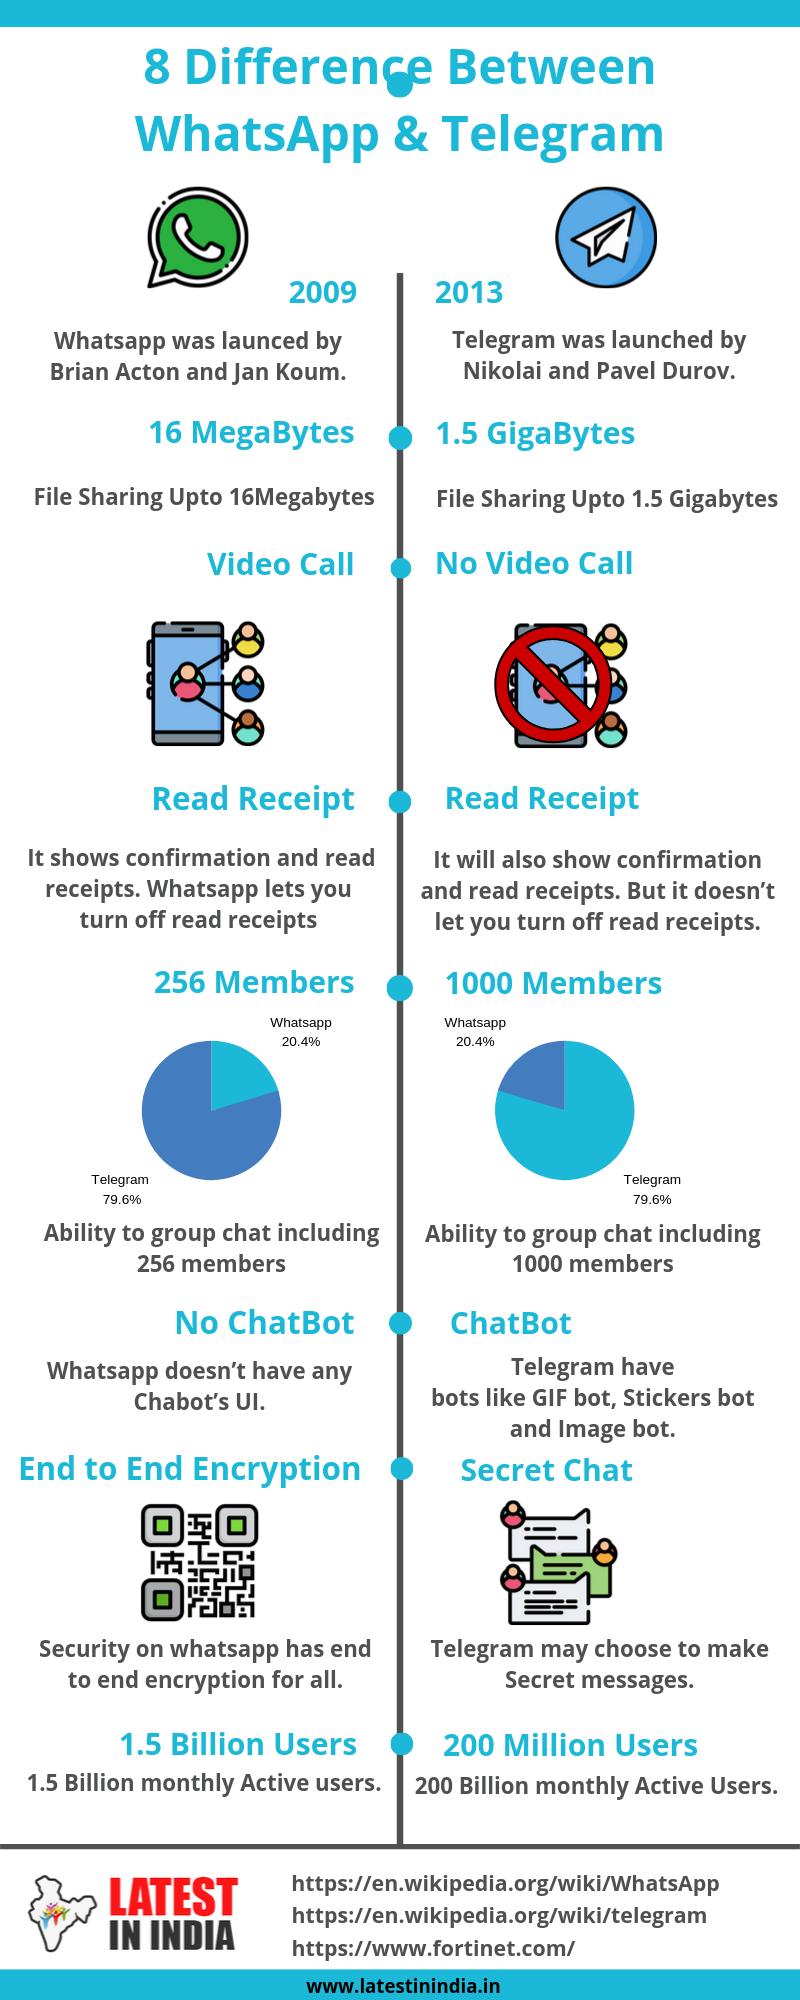 8 Difference between Whatsapp & Telegram